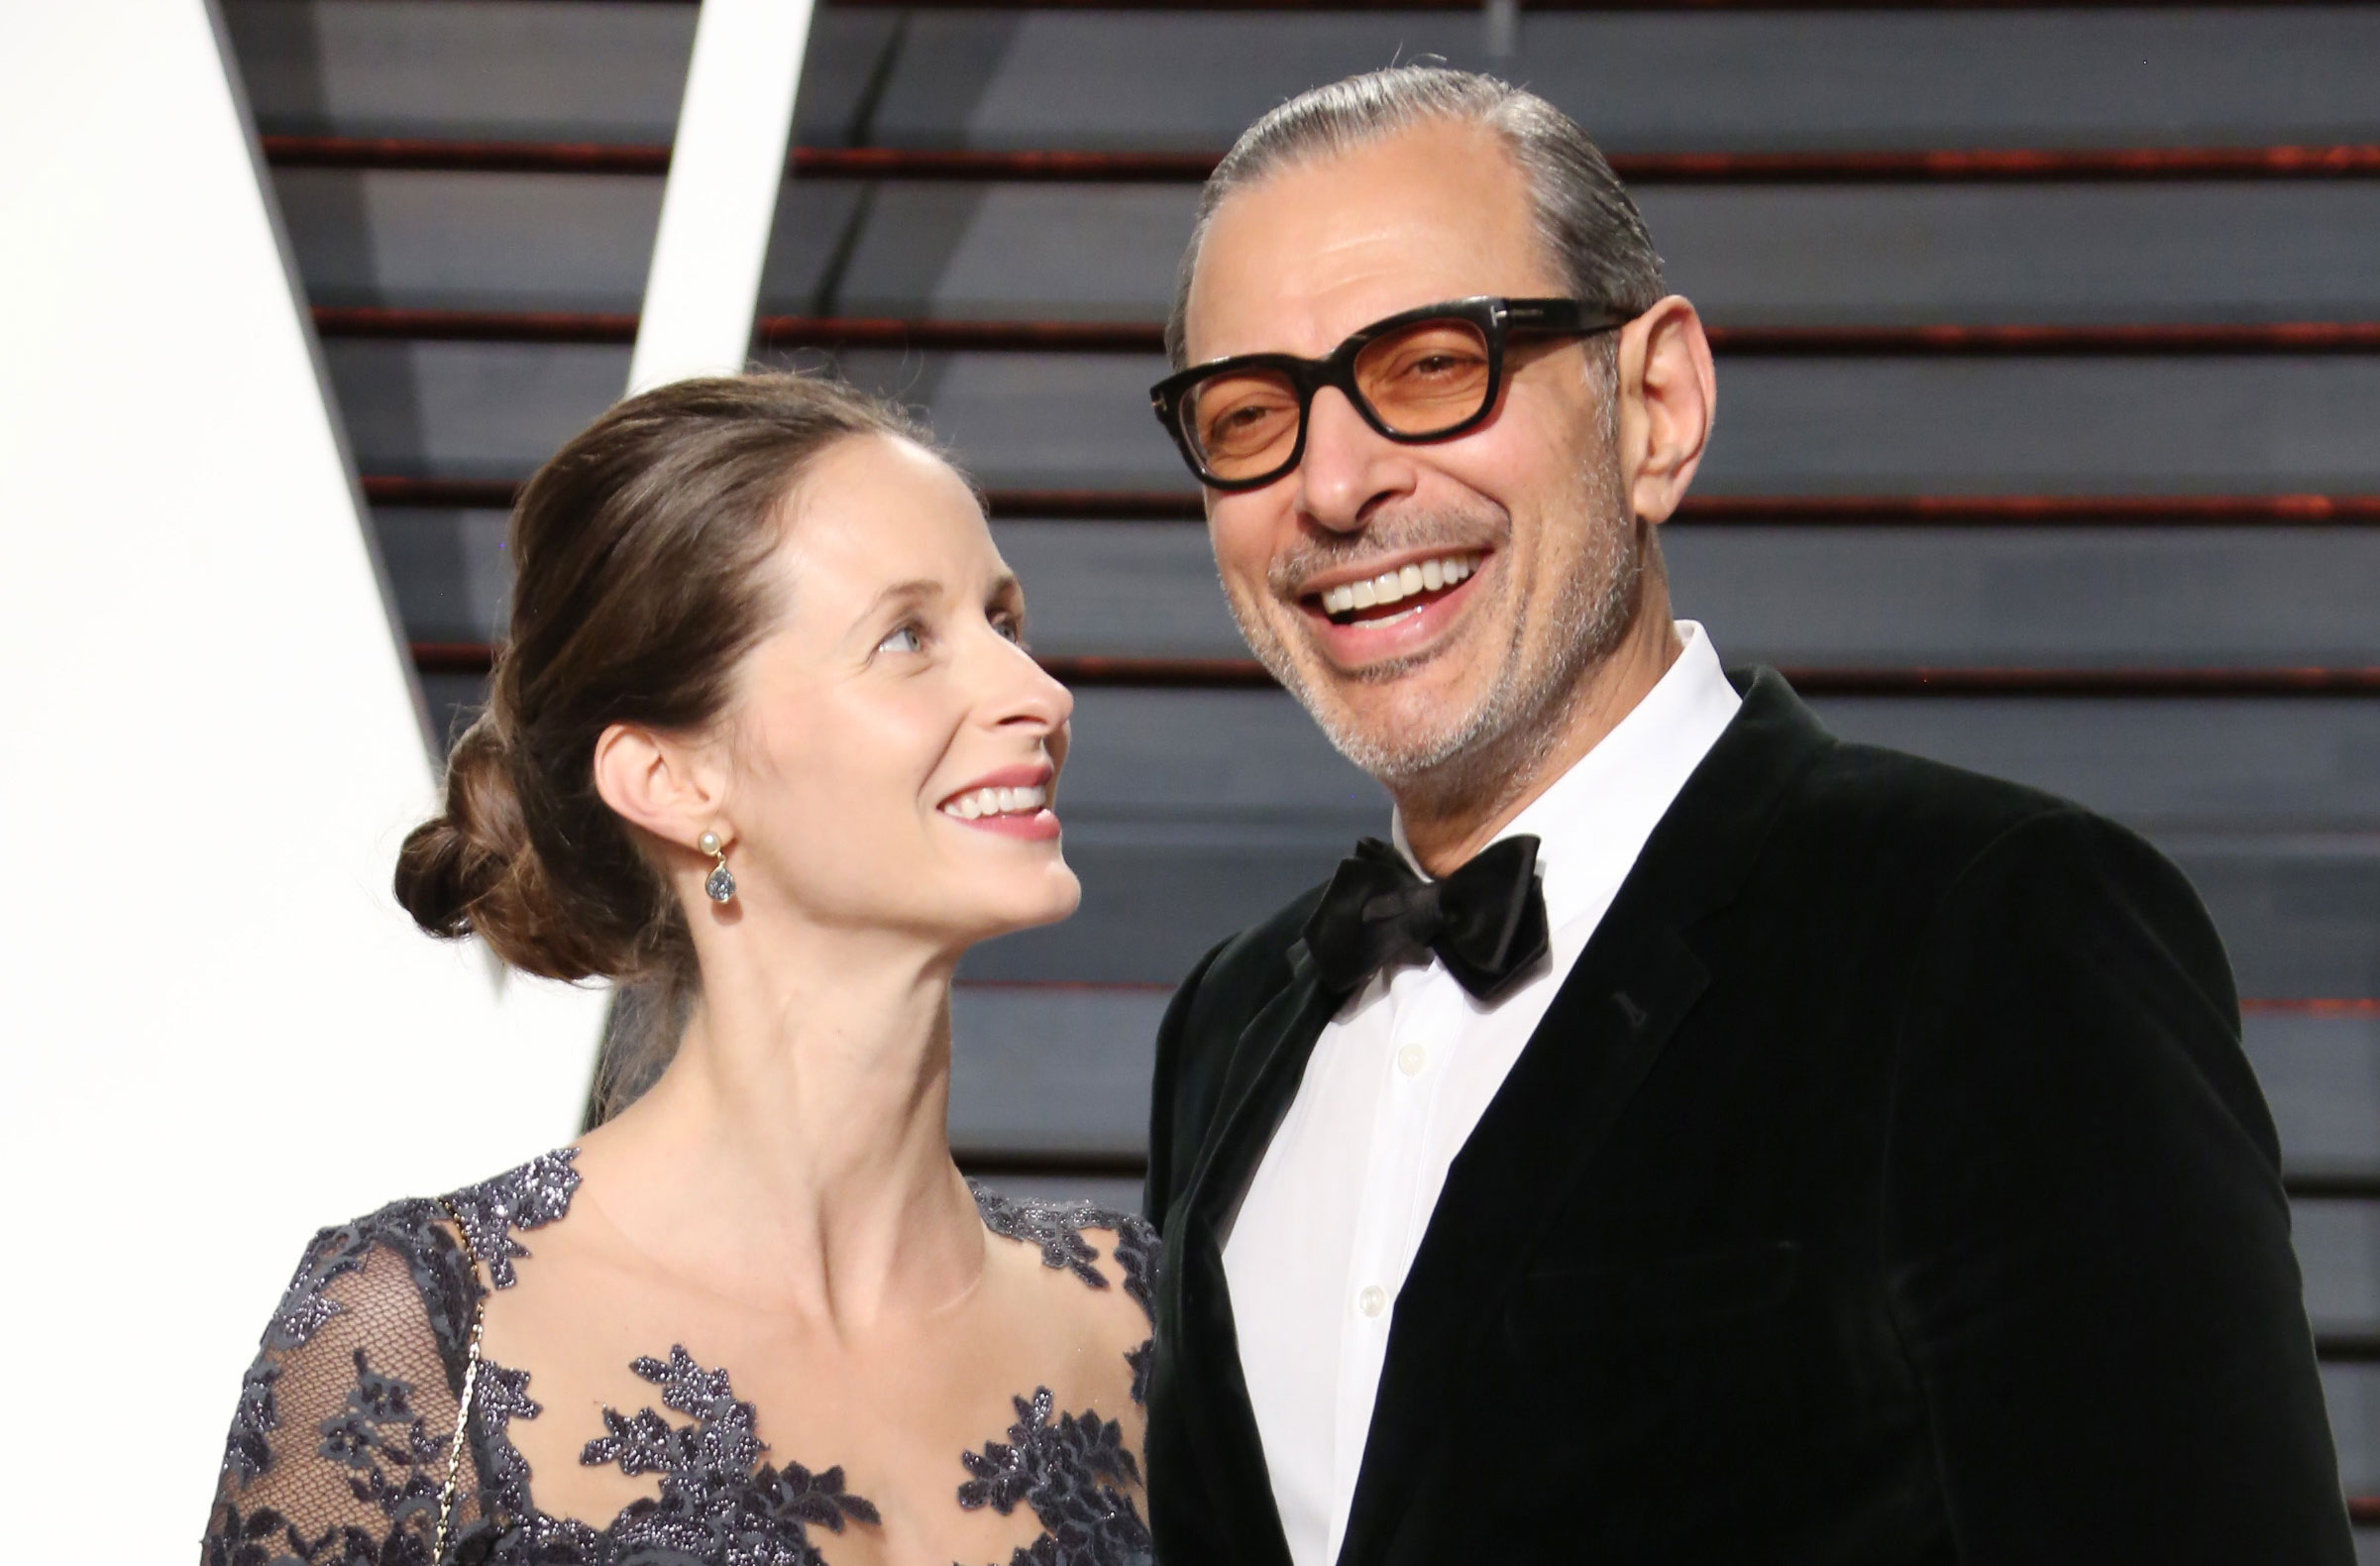 Actor Jeff Goldblum S Wife Emilie Livingston Reveals They